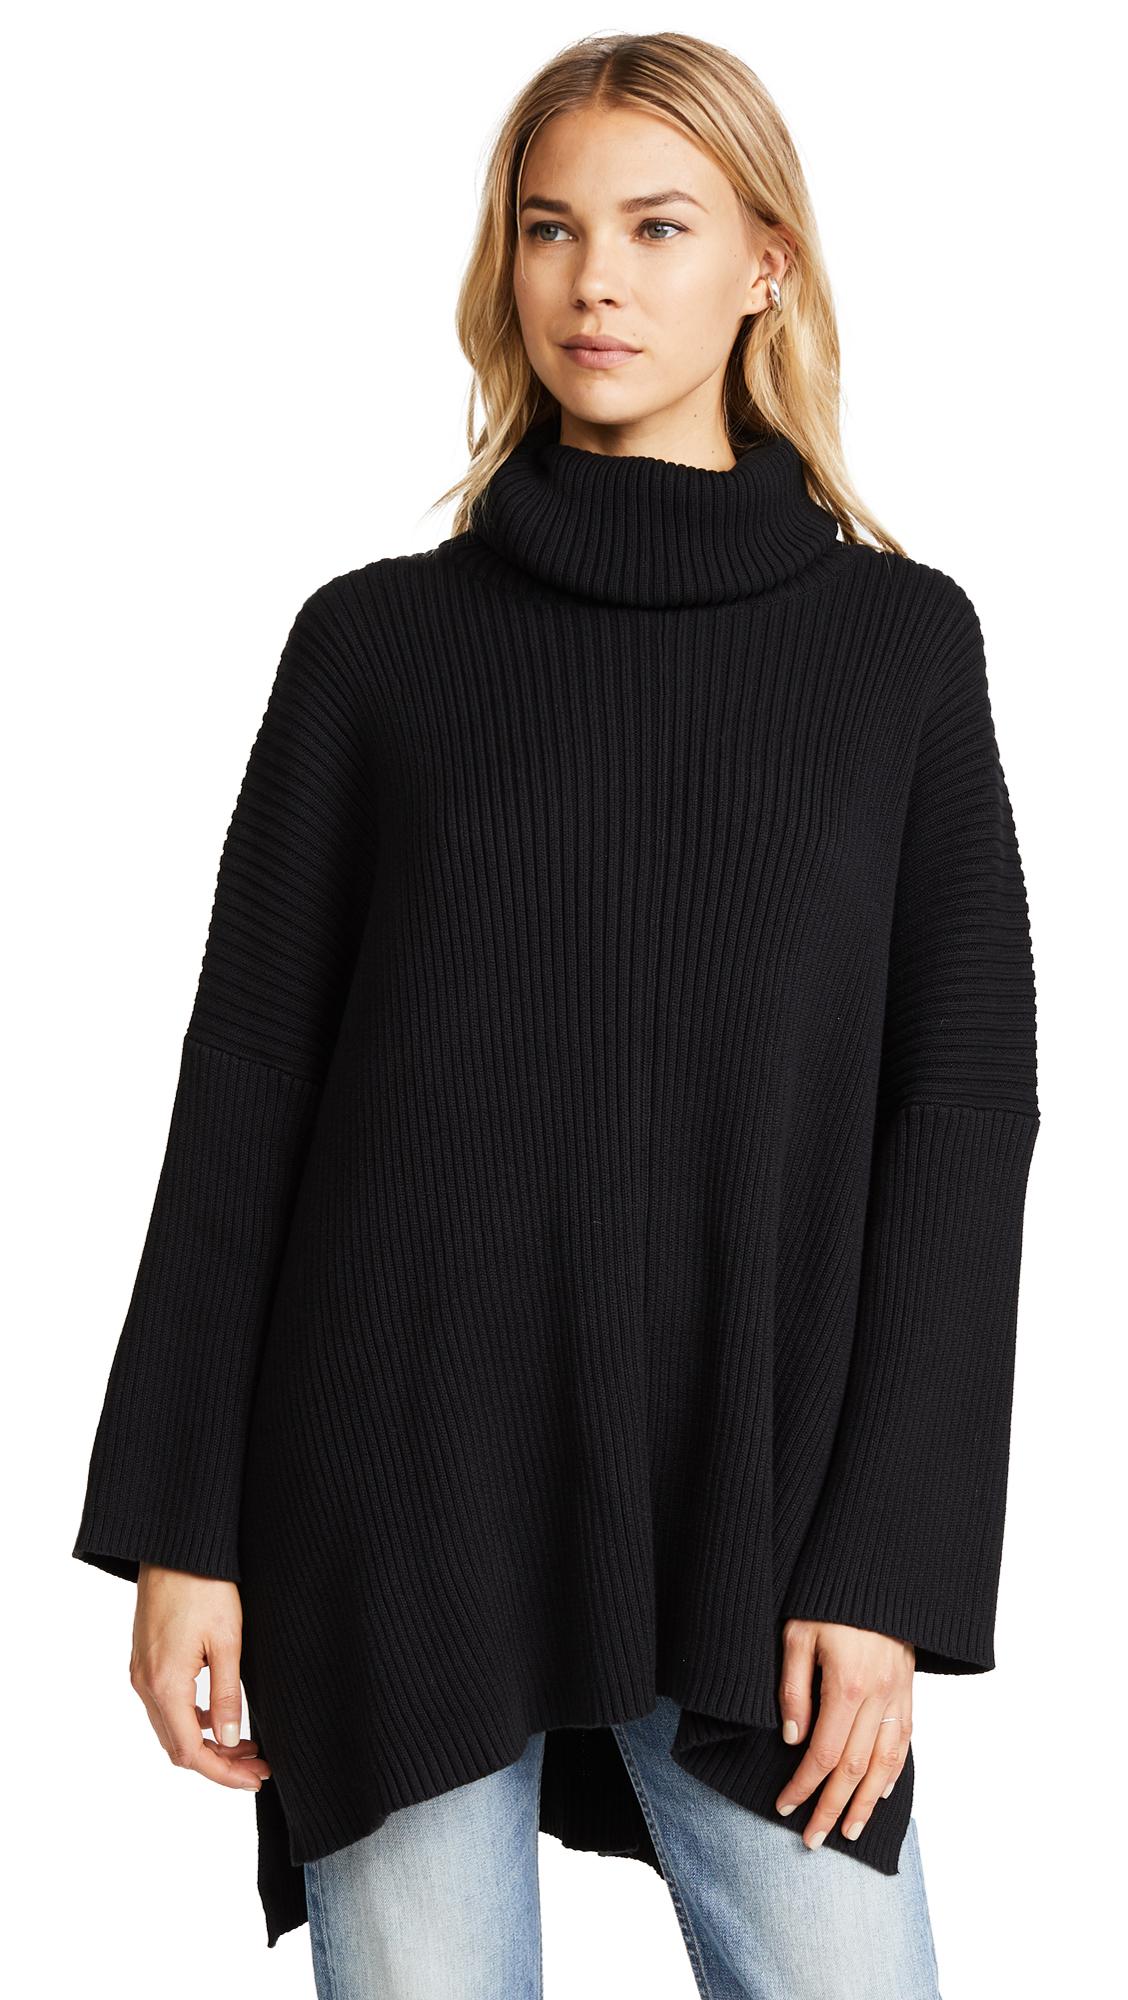 Oak Massive Turtleneck Sweater